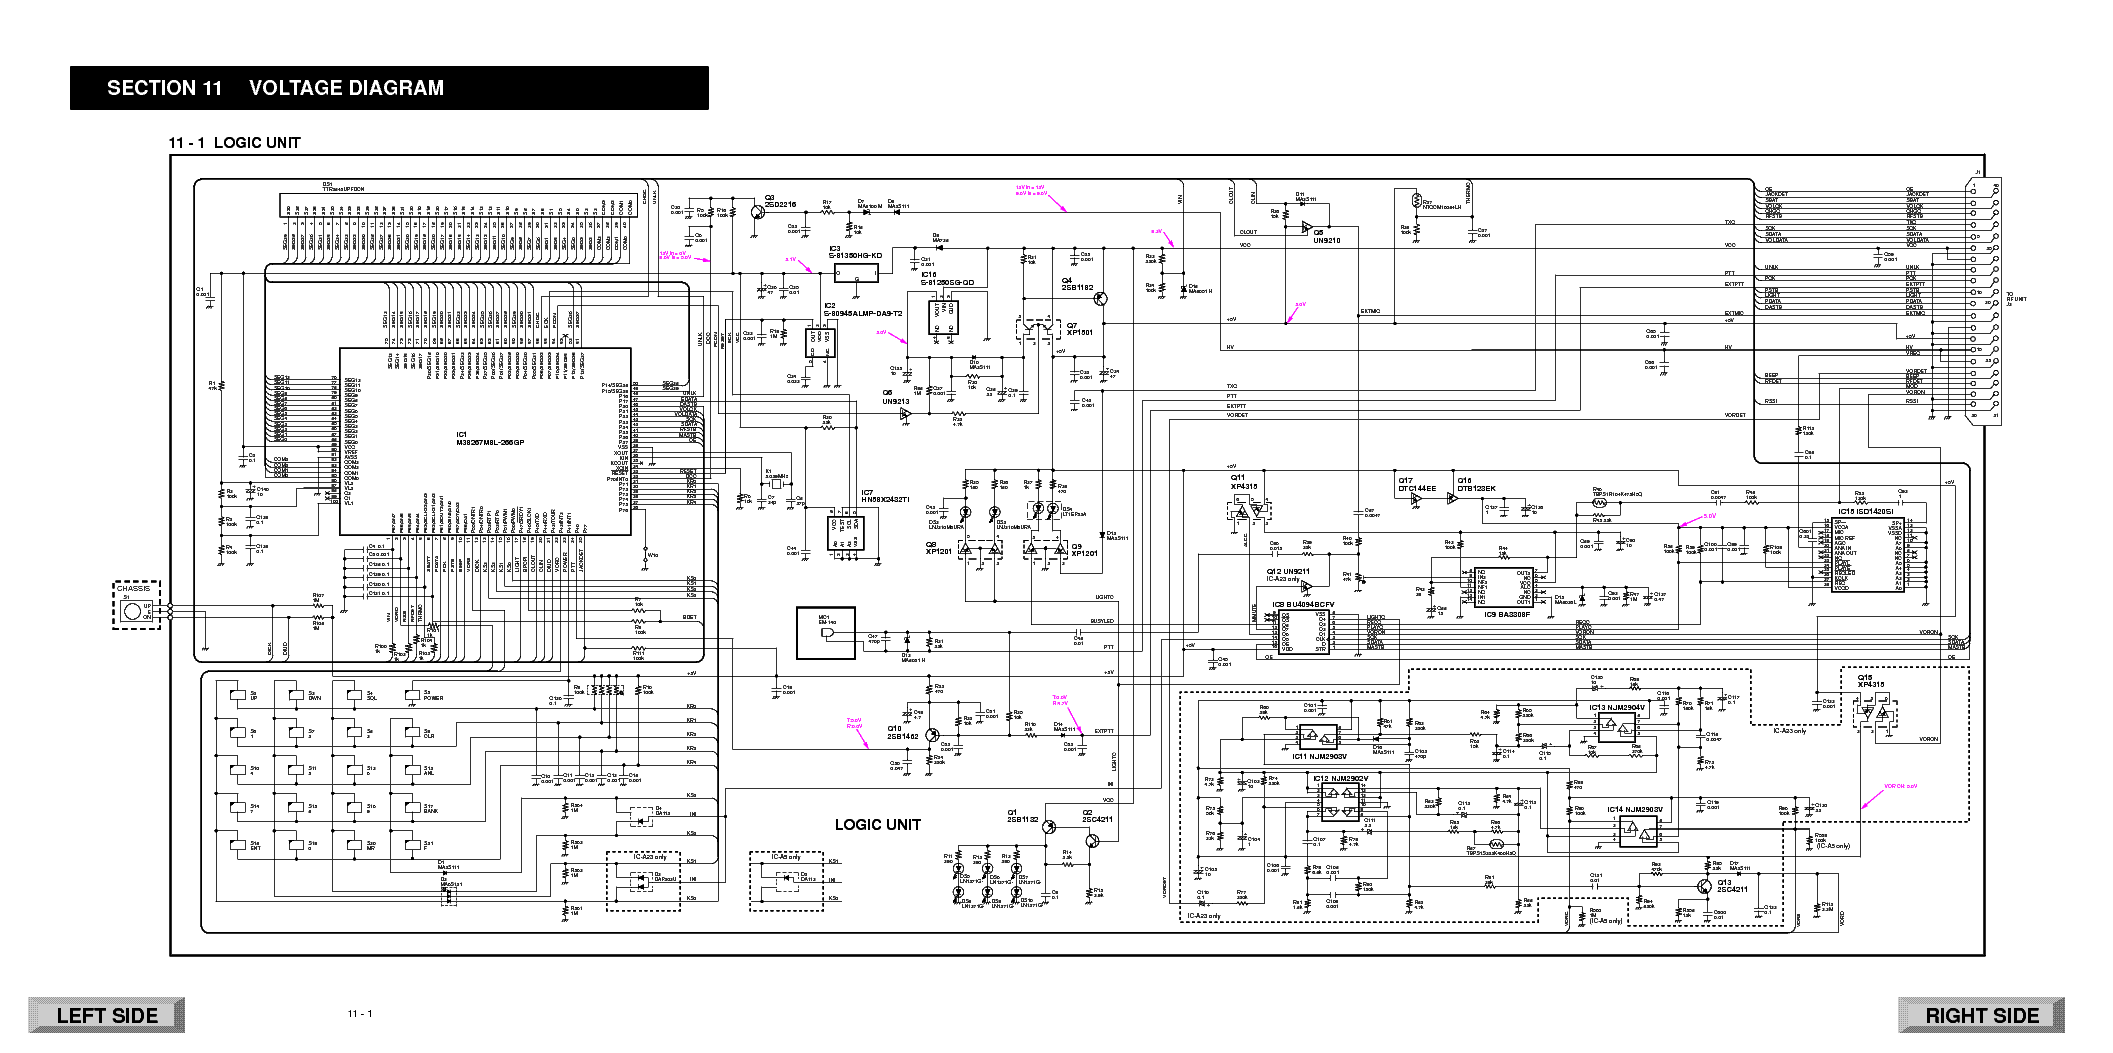 icom ic a23 a5 service manual download schematics eeprom repair rh elektrotanya com icom ic-a5 manual icom ic-a5 manual pdf